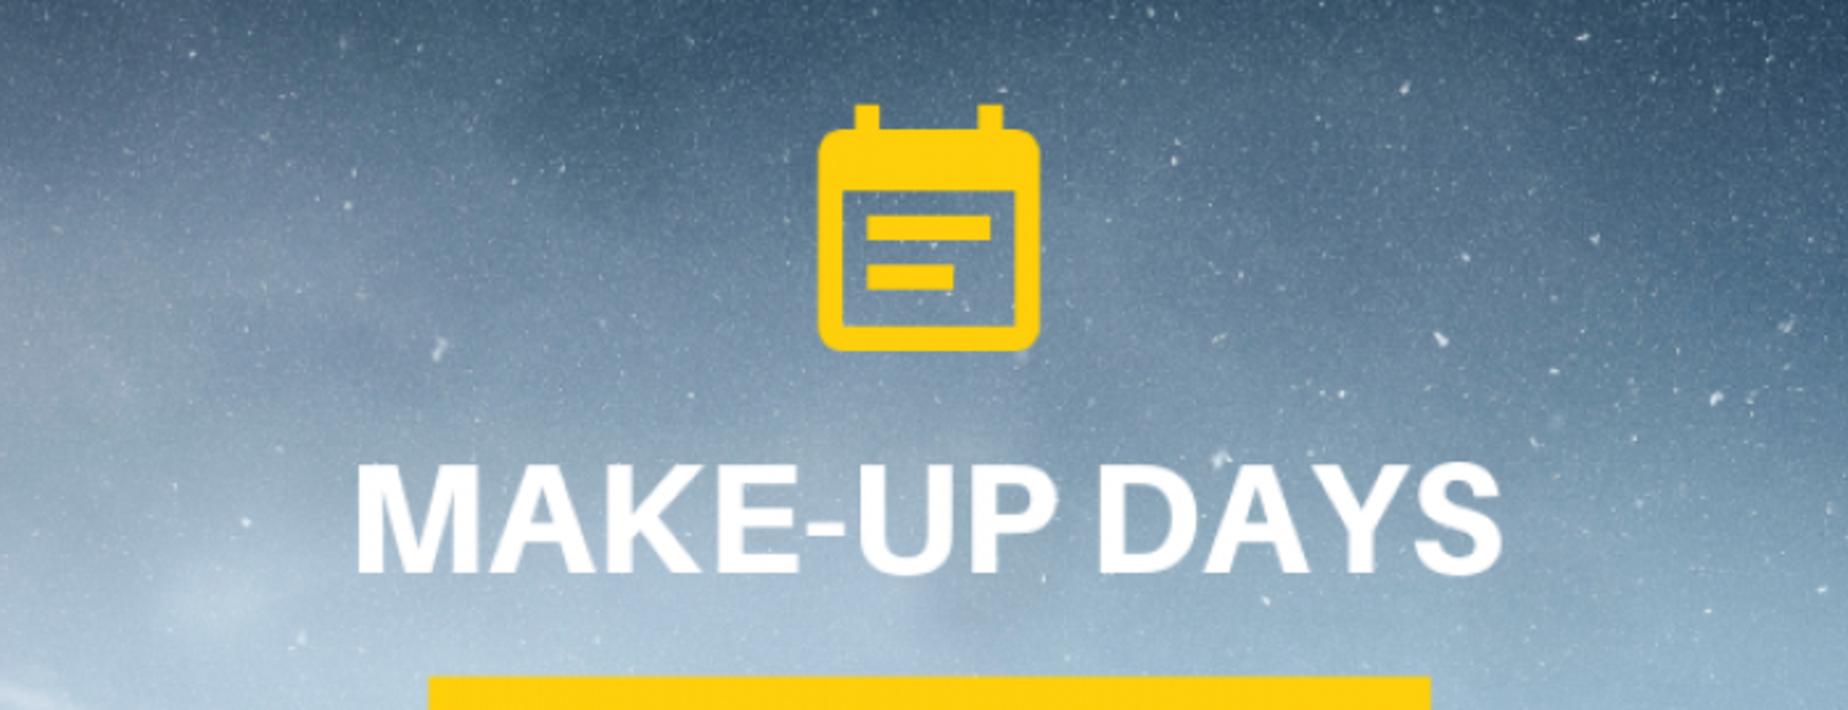 Make up days image